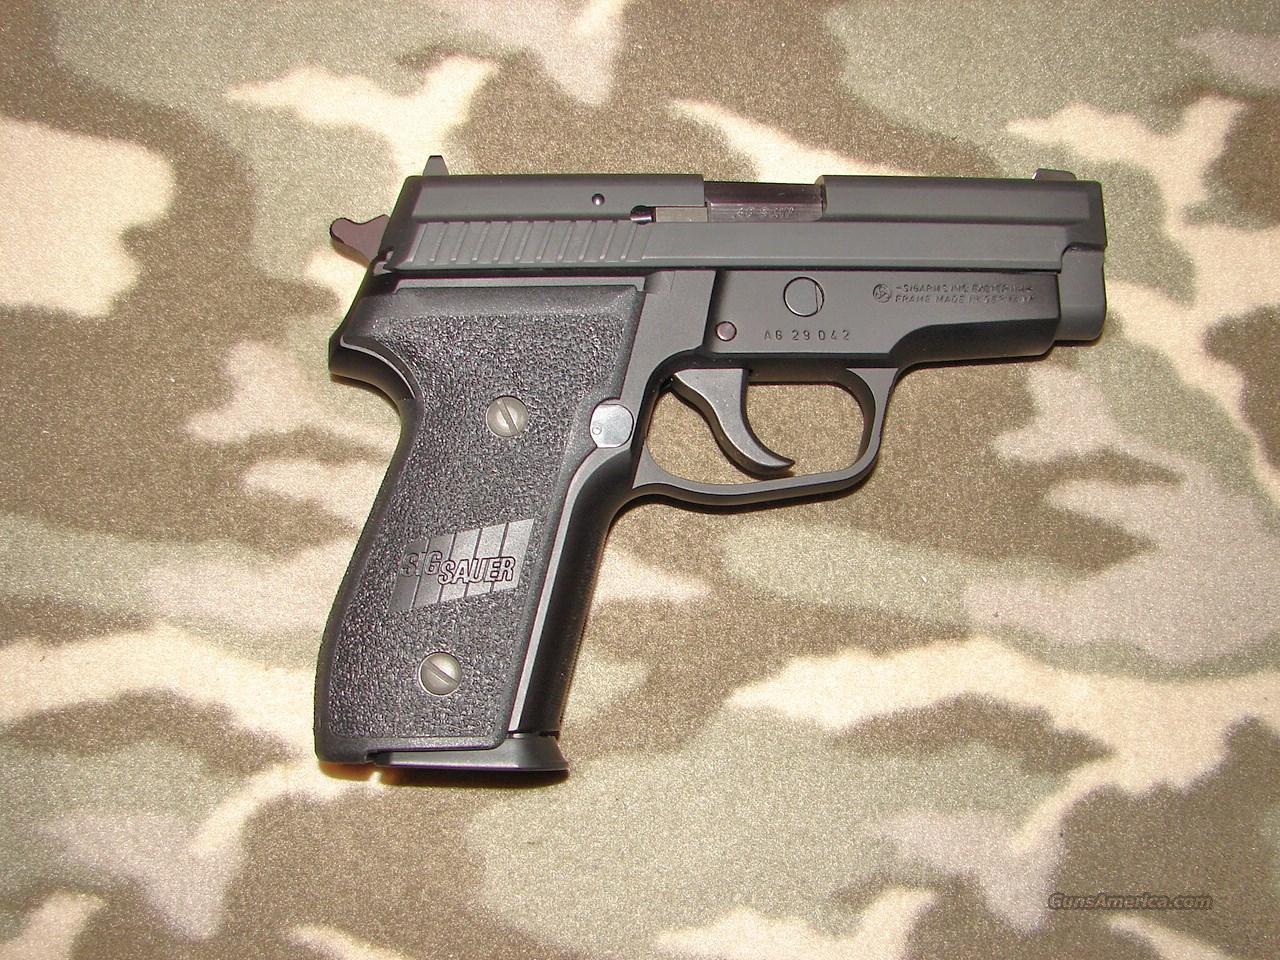 Sig Sauer P229 40 S&W  Guns > Pistols > Sig - Sauer/Sigarms Pistols > P229